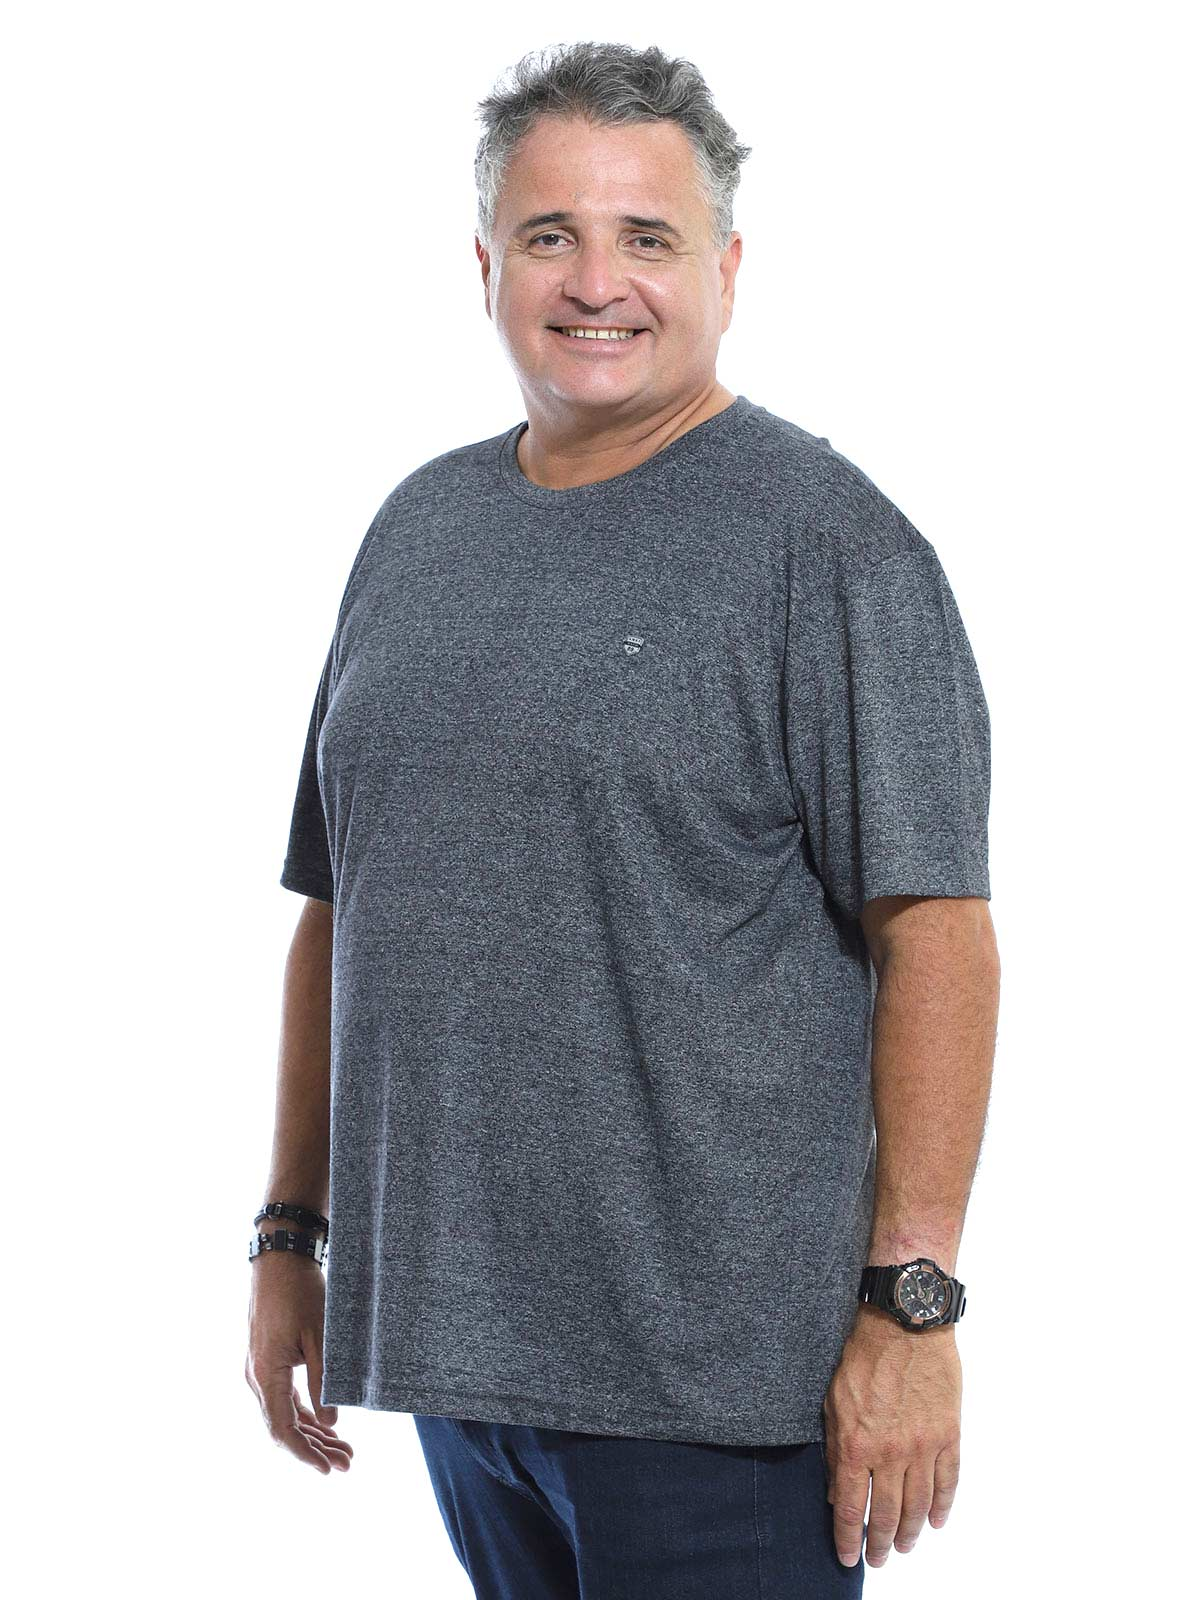 Camiseta Plus Size Anistia Mouline Preto